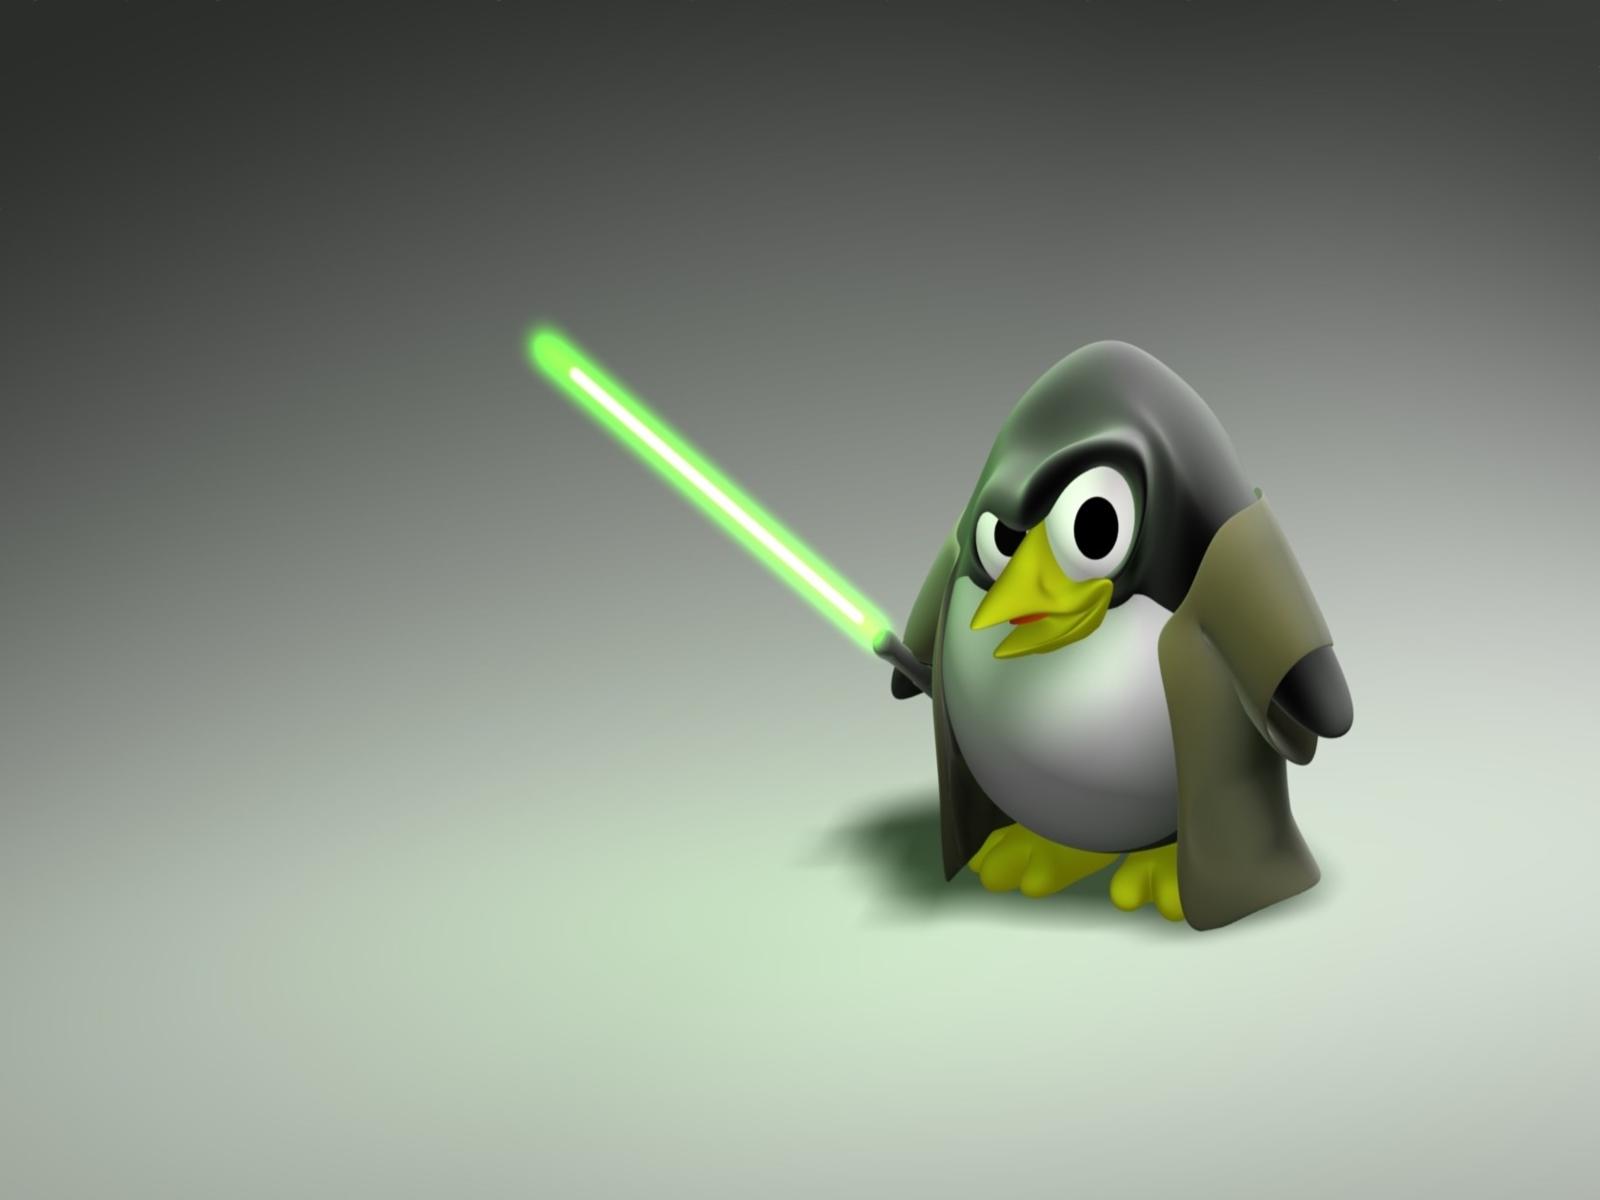 Linux Ubuntu Desktop Background newhairstylesformen2014com 1600x1200